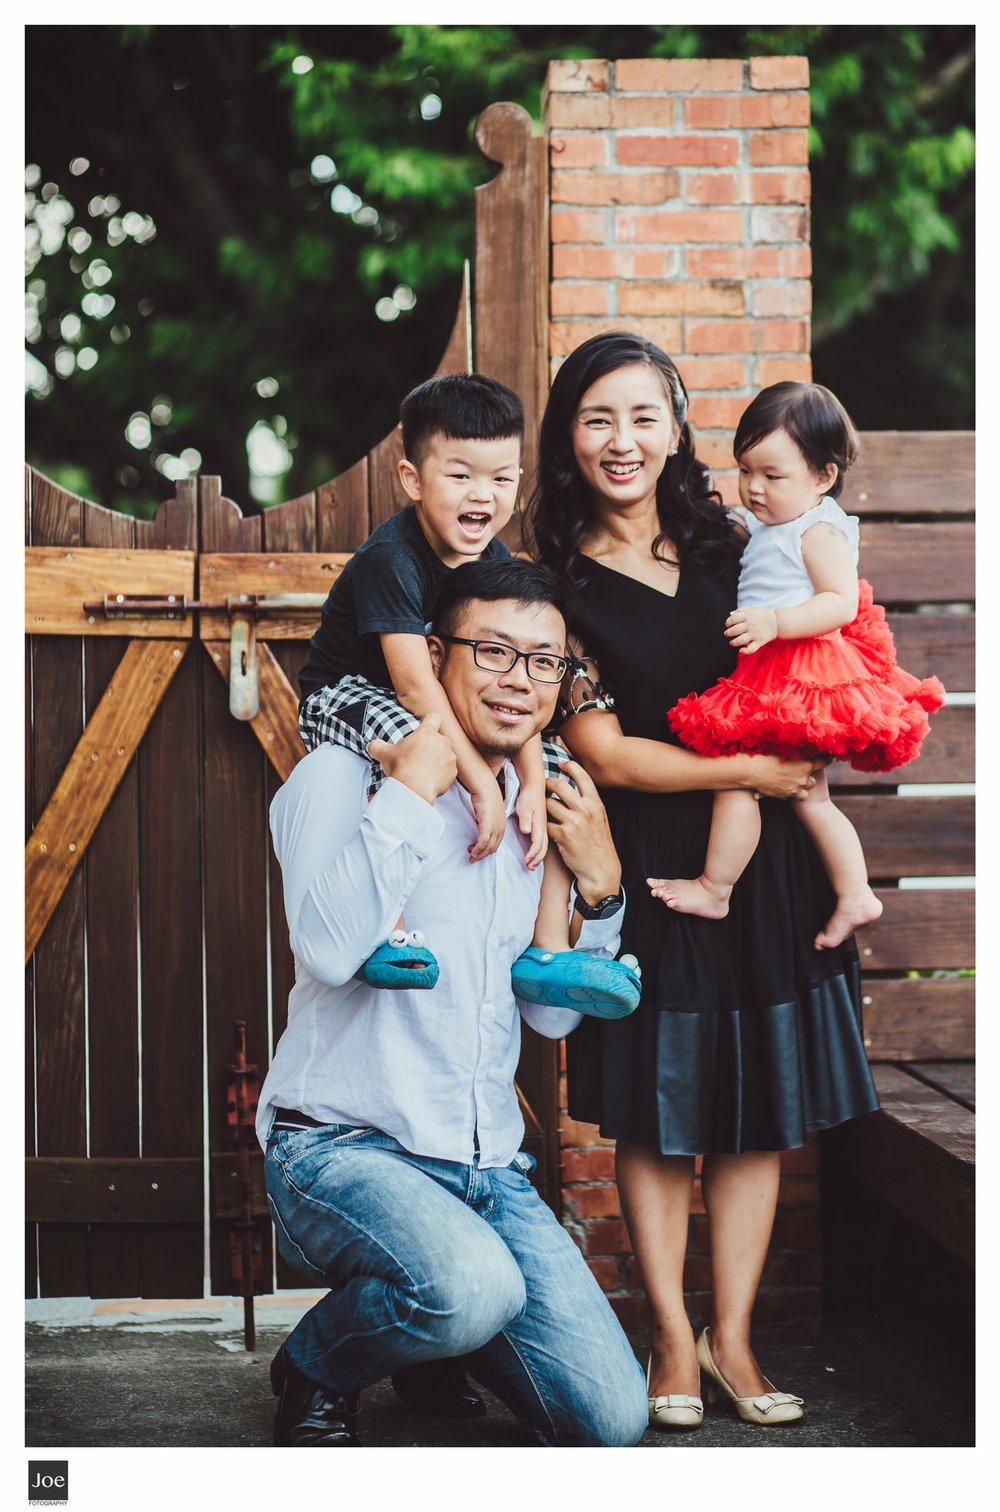 joe-fotography-family-photo-pepper-salt-bowtie-028.jpg